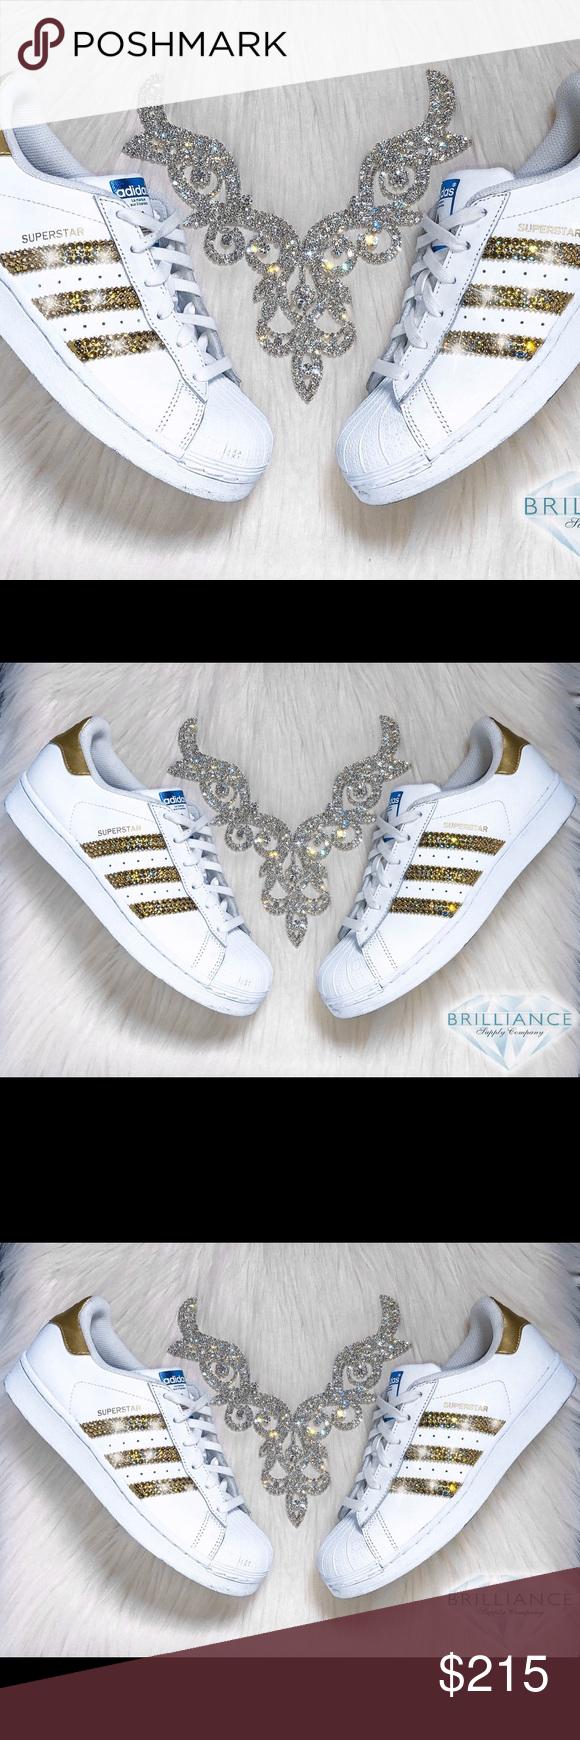 new style 01209 3eea4 Swarovski Adidas Superstars White   Gold Metallic Authentic Adidas  Superstar Shoes In White Gold Metallic (Order 1 2 size smaller than normal).